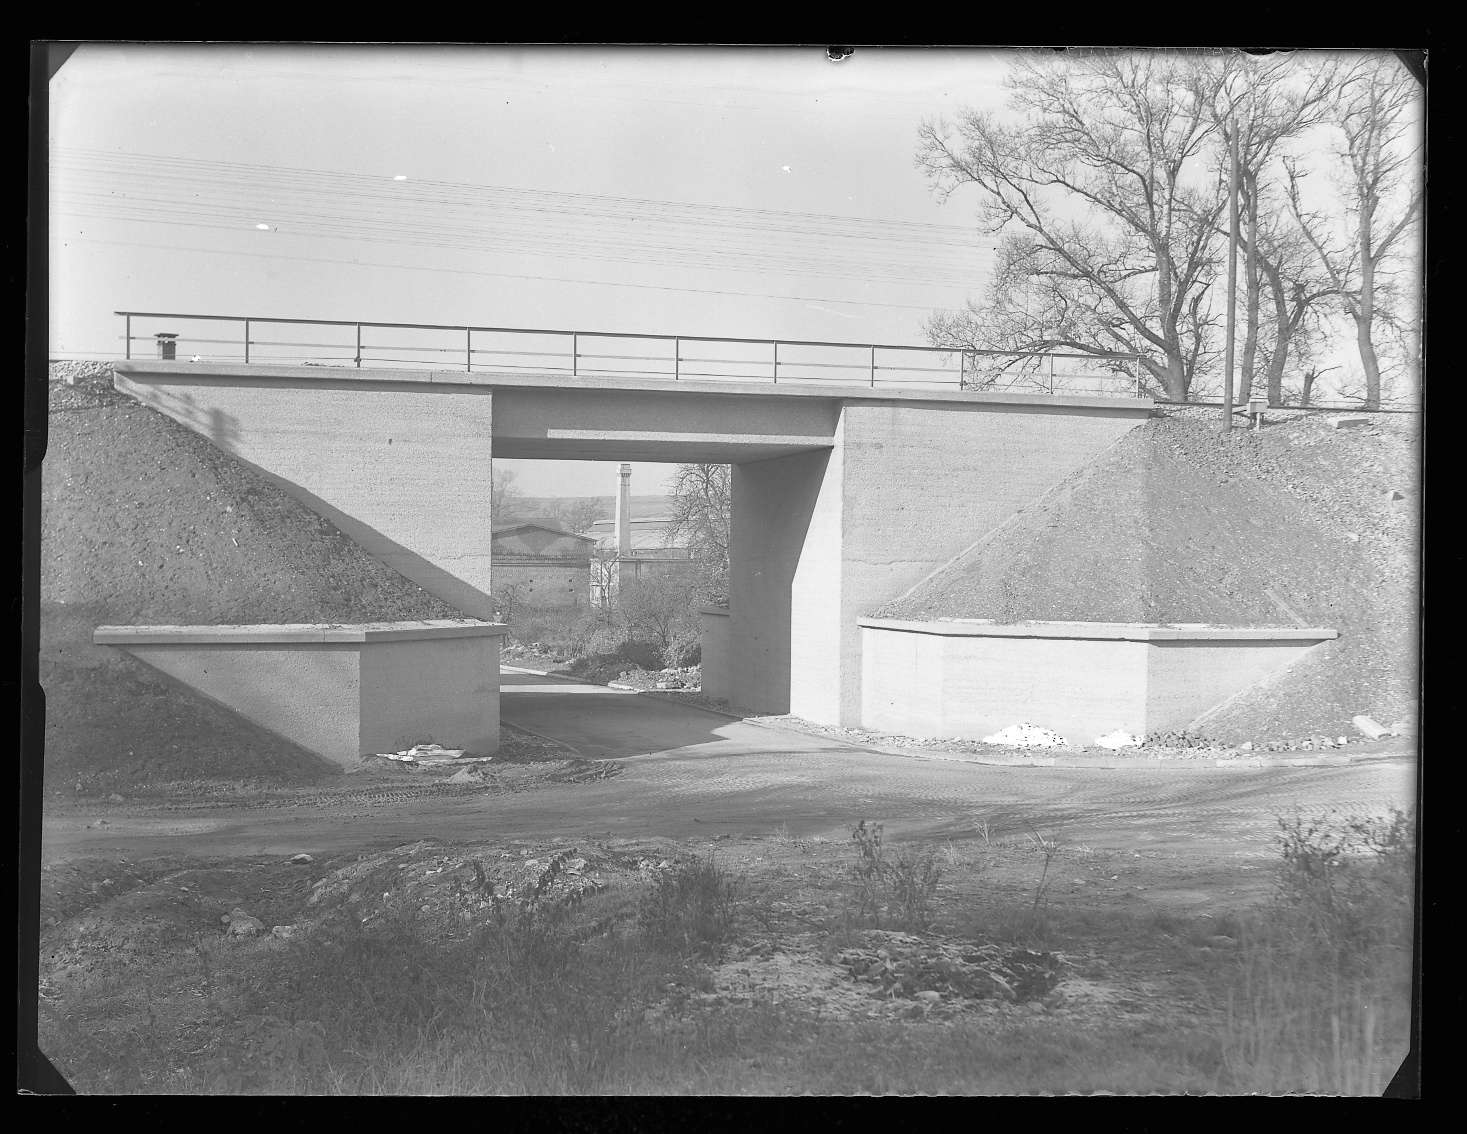 Wasseralfingen, Bf, neue Brücke (fertiger Zustand), Abb. b